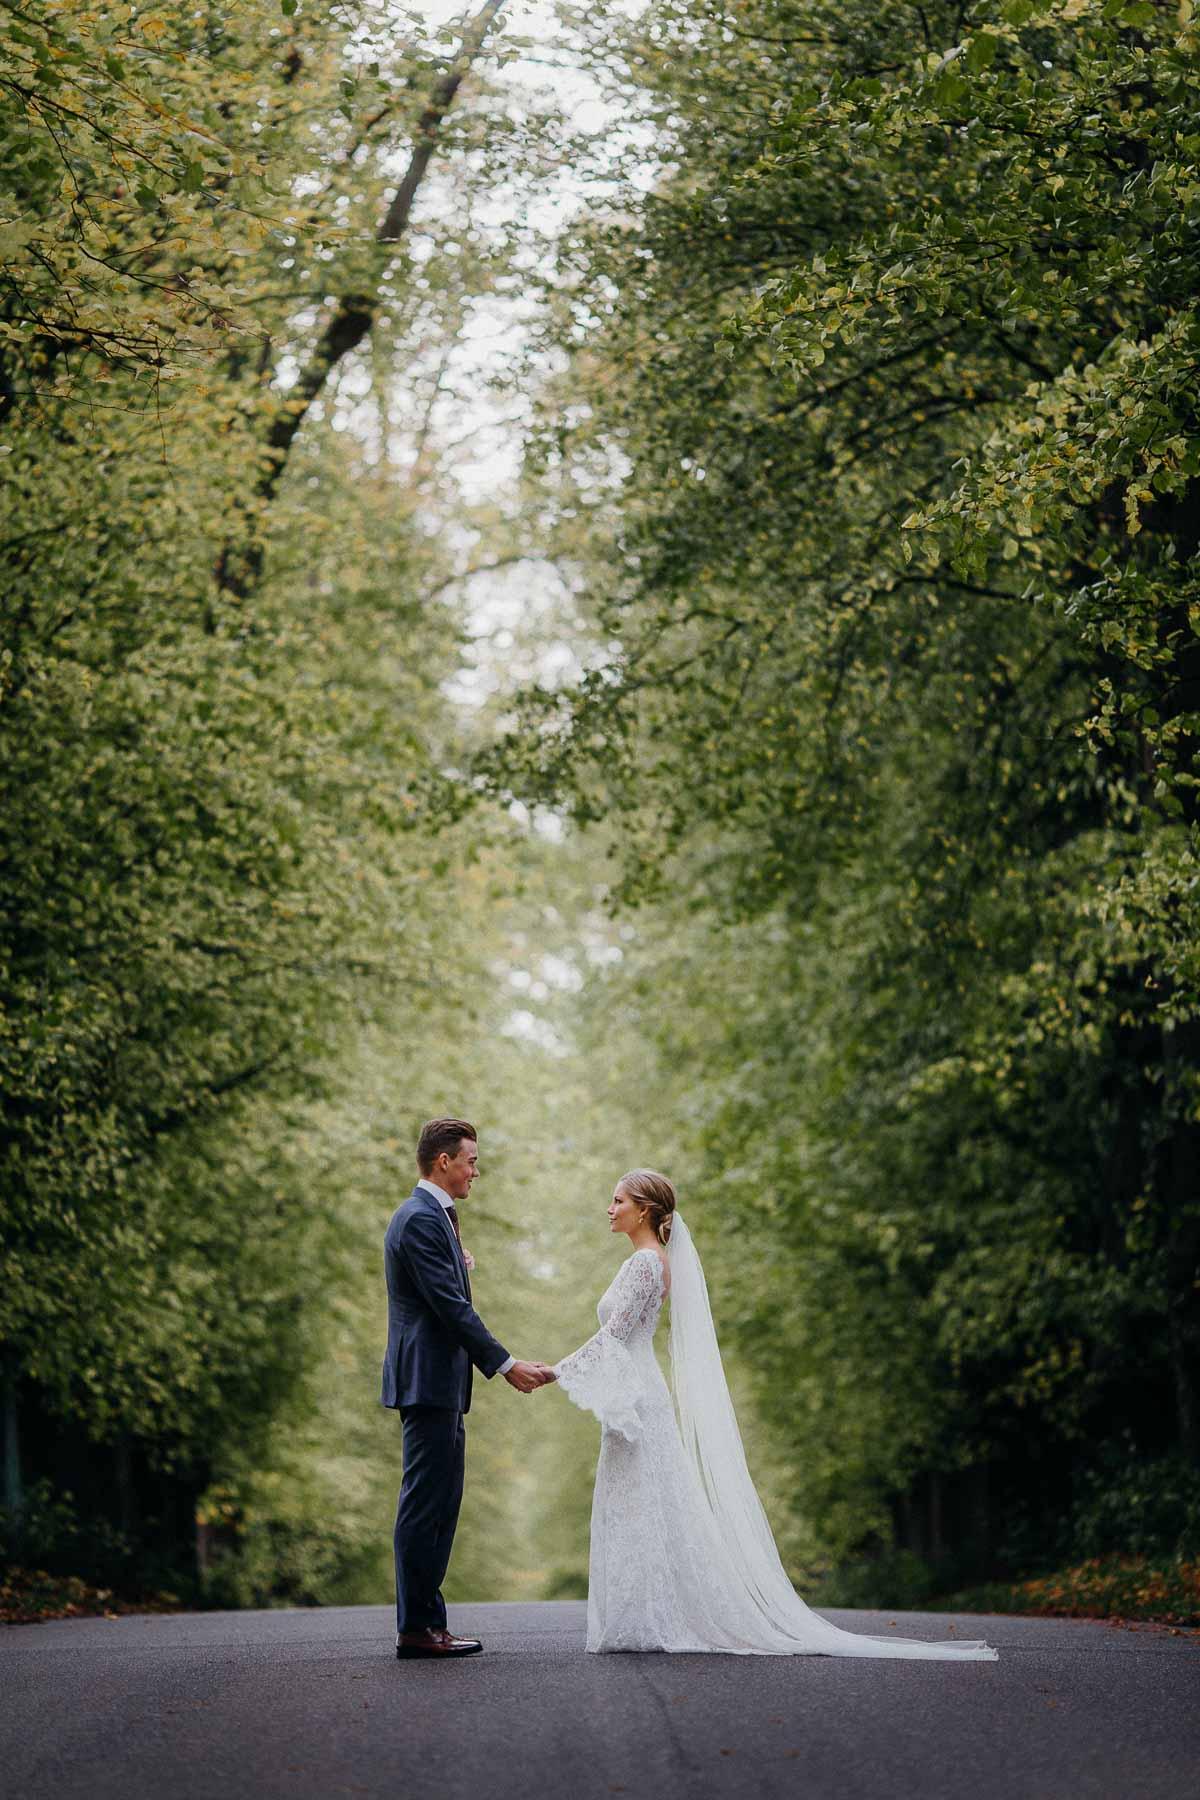 Hvor i Esbjerg skal brylluppet stå?